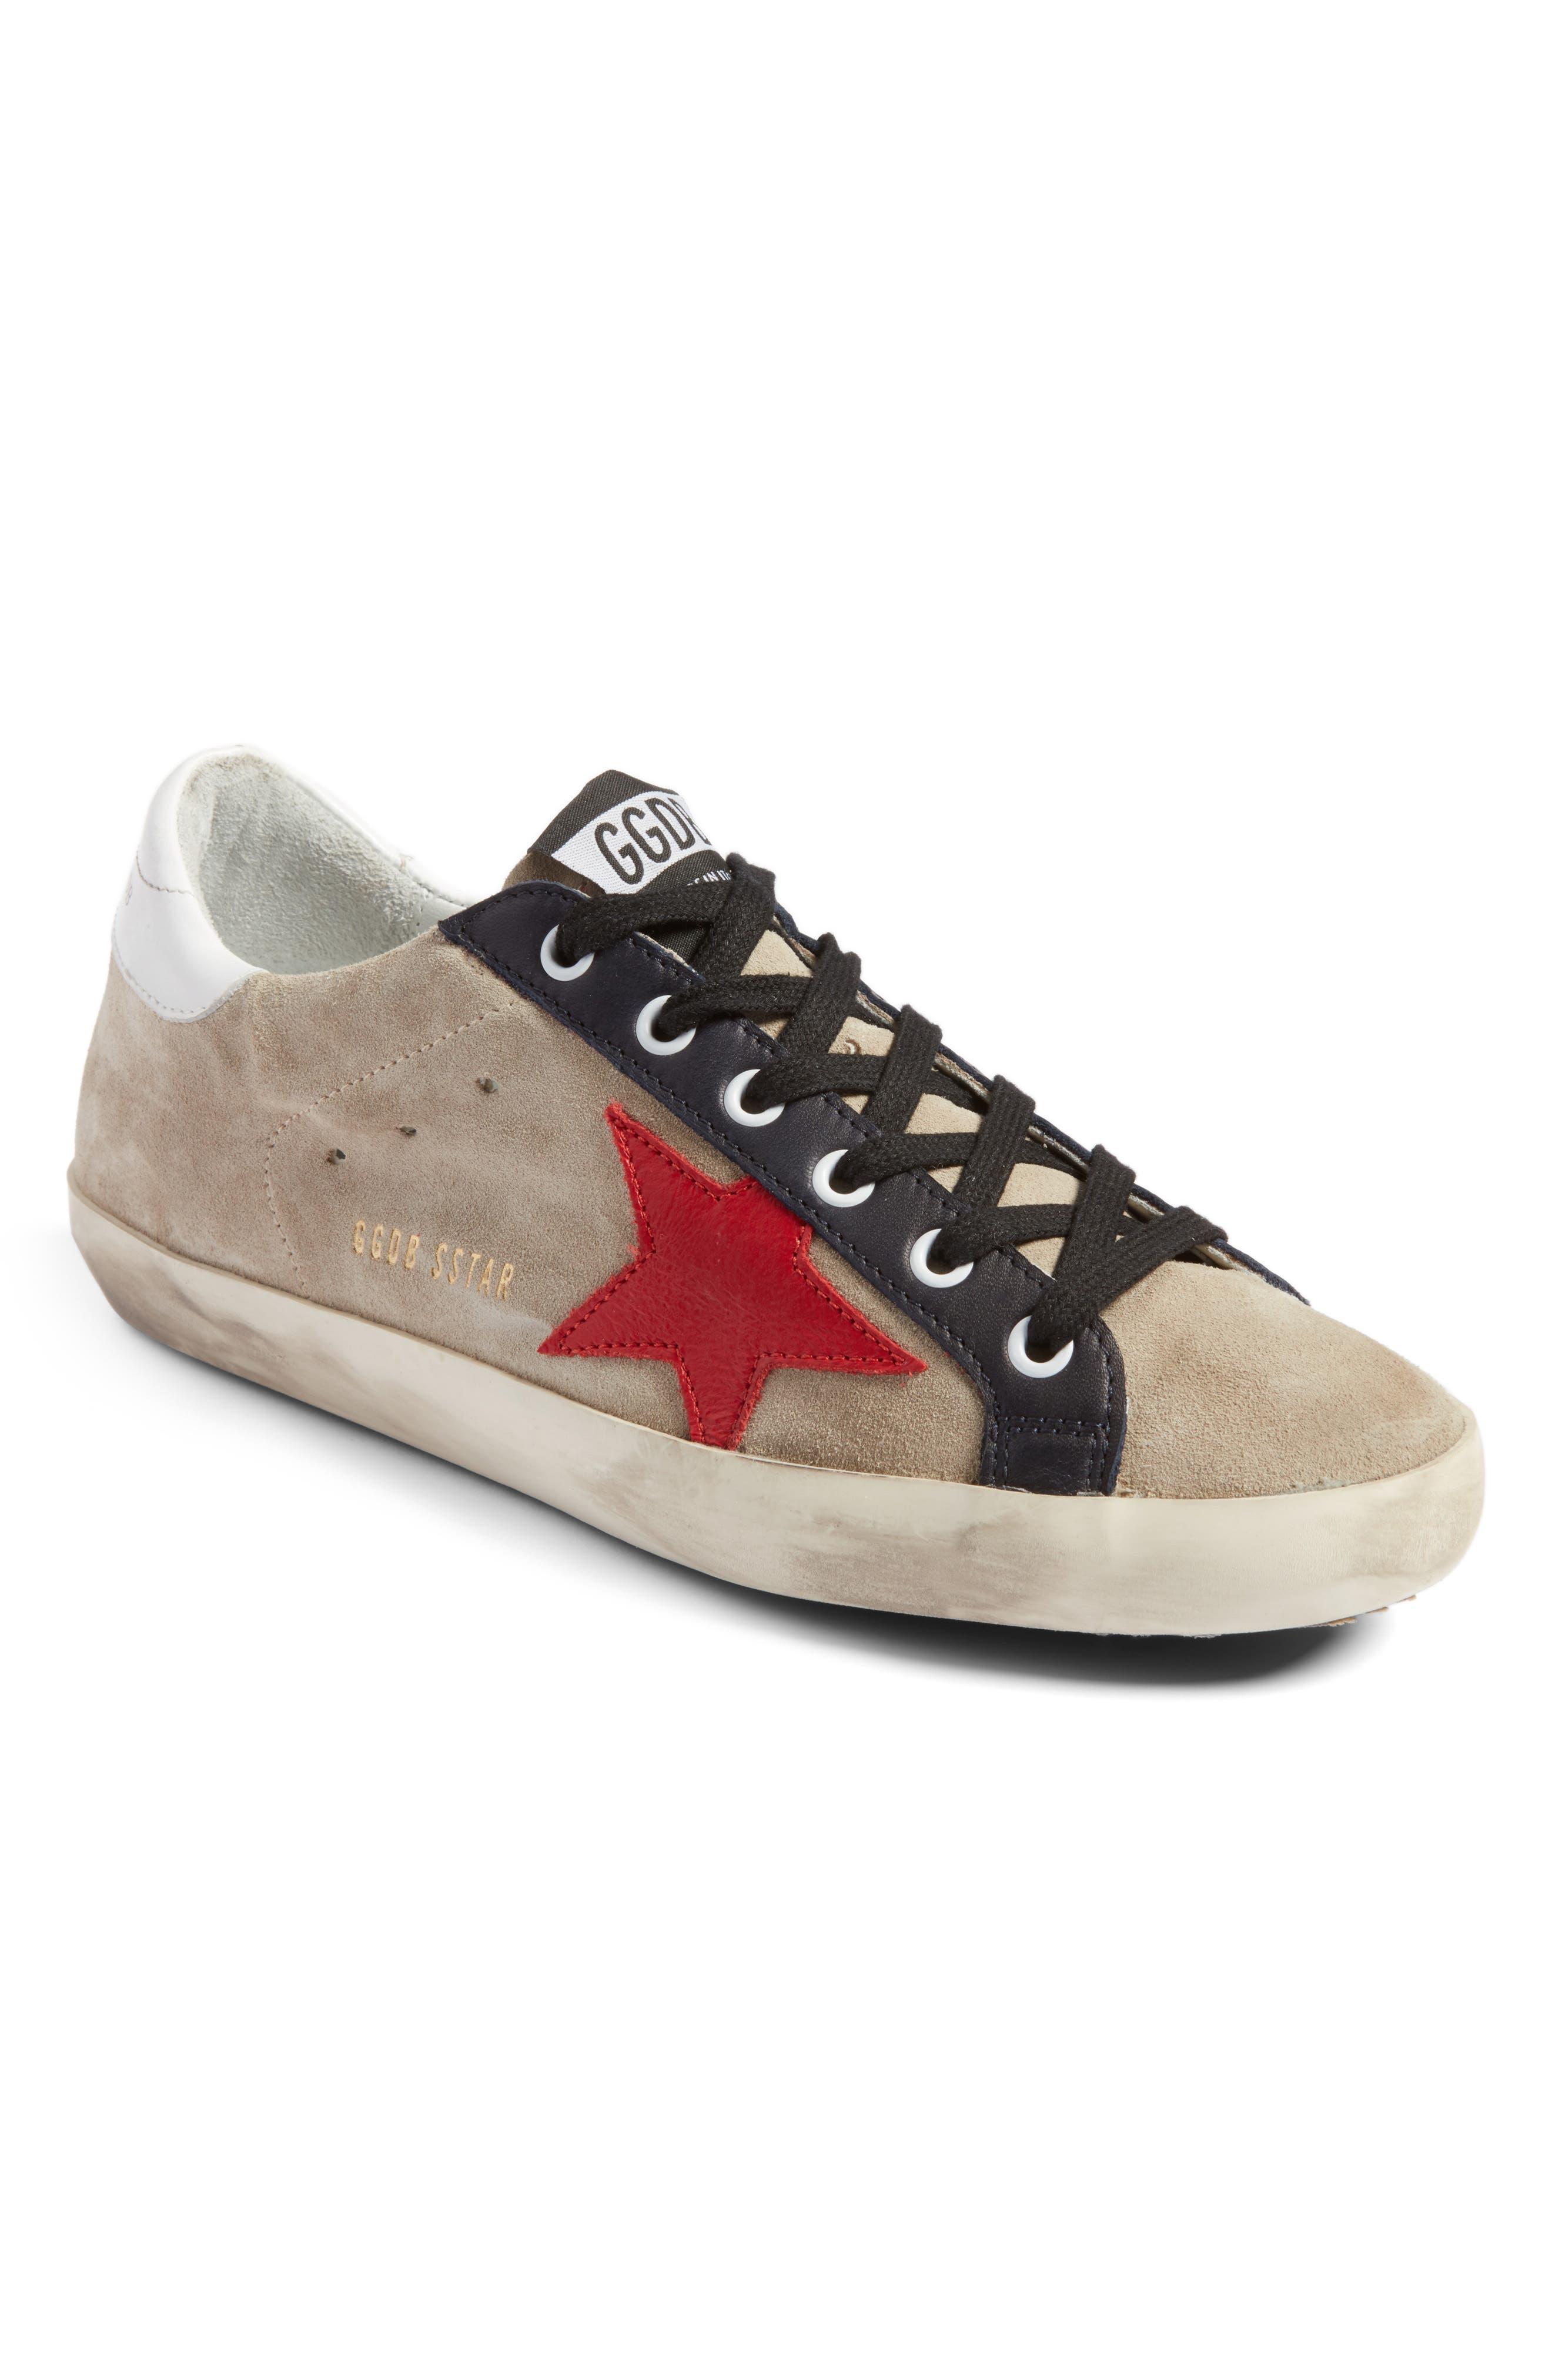 Superstar Sneaker,                             Main thumbnail 1, color,                             250